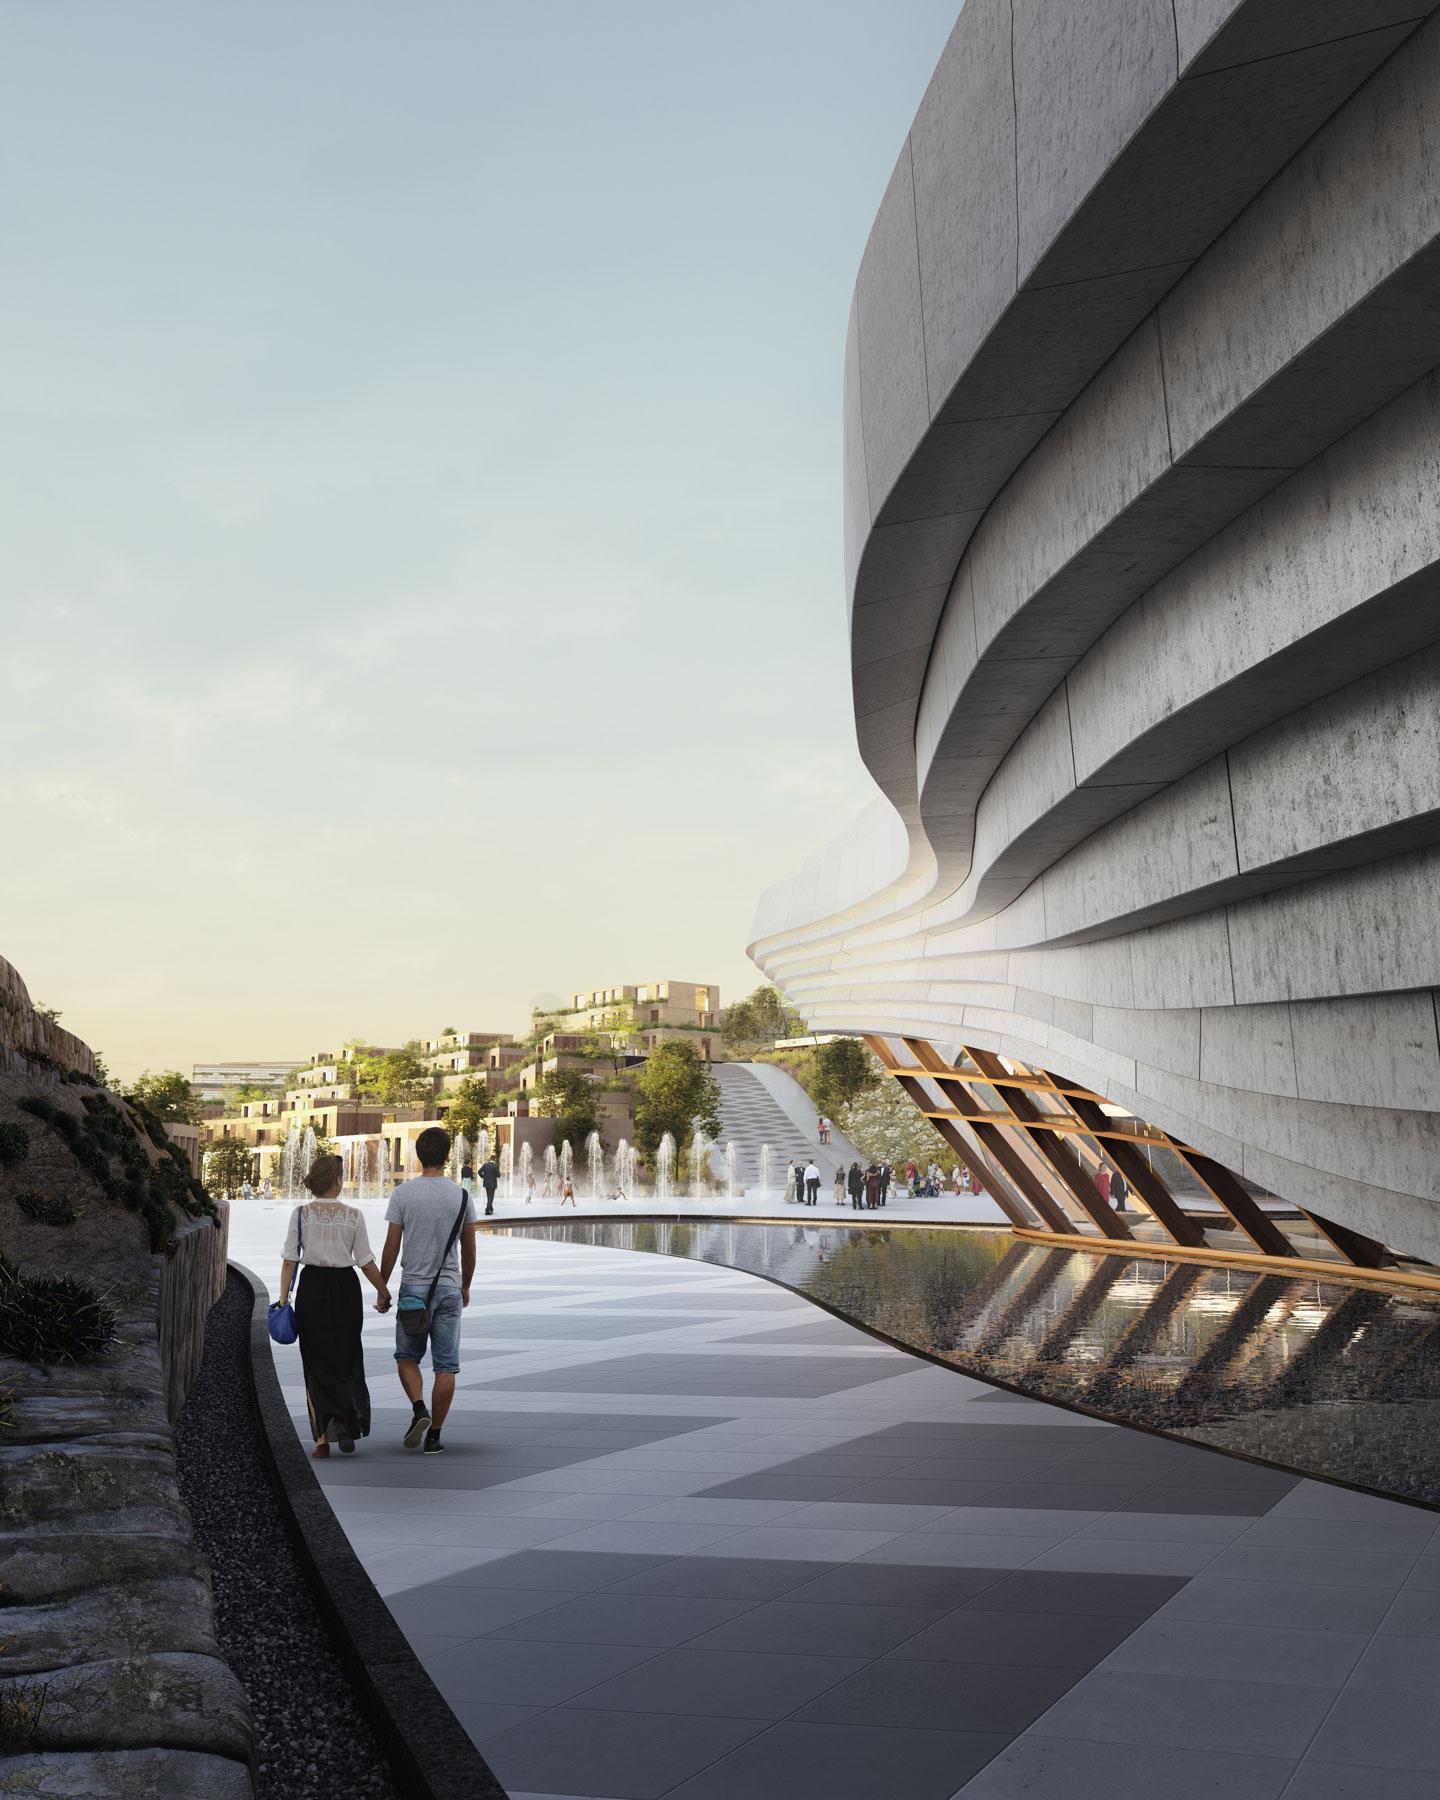 3D exterior theatre visualization images